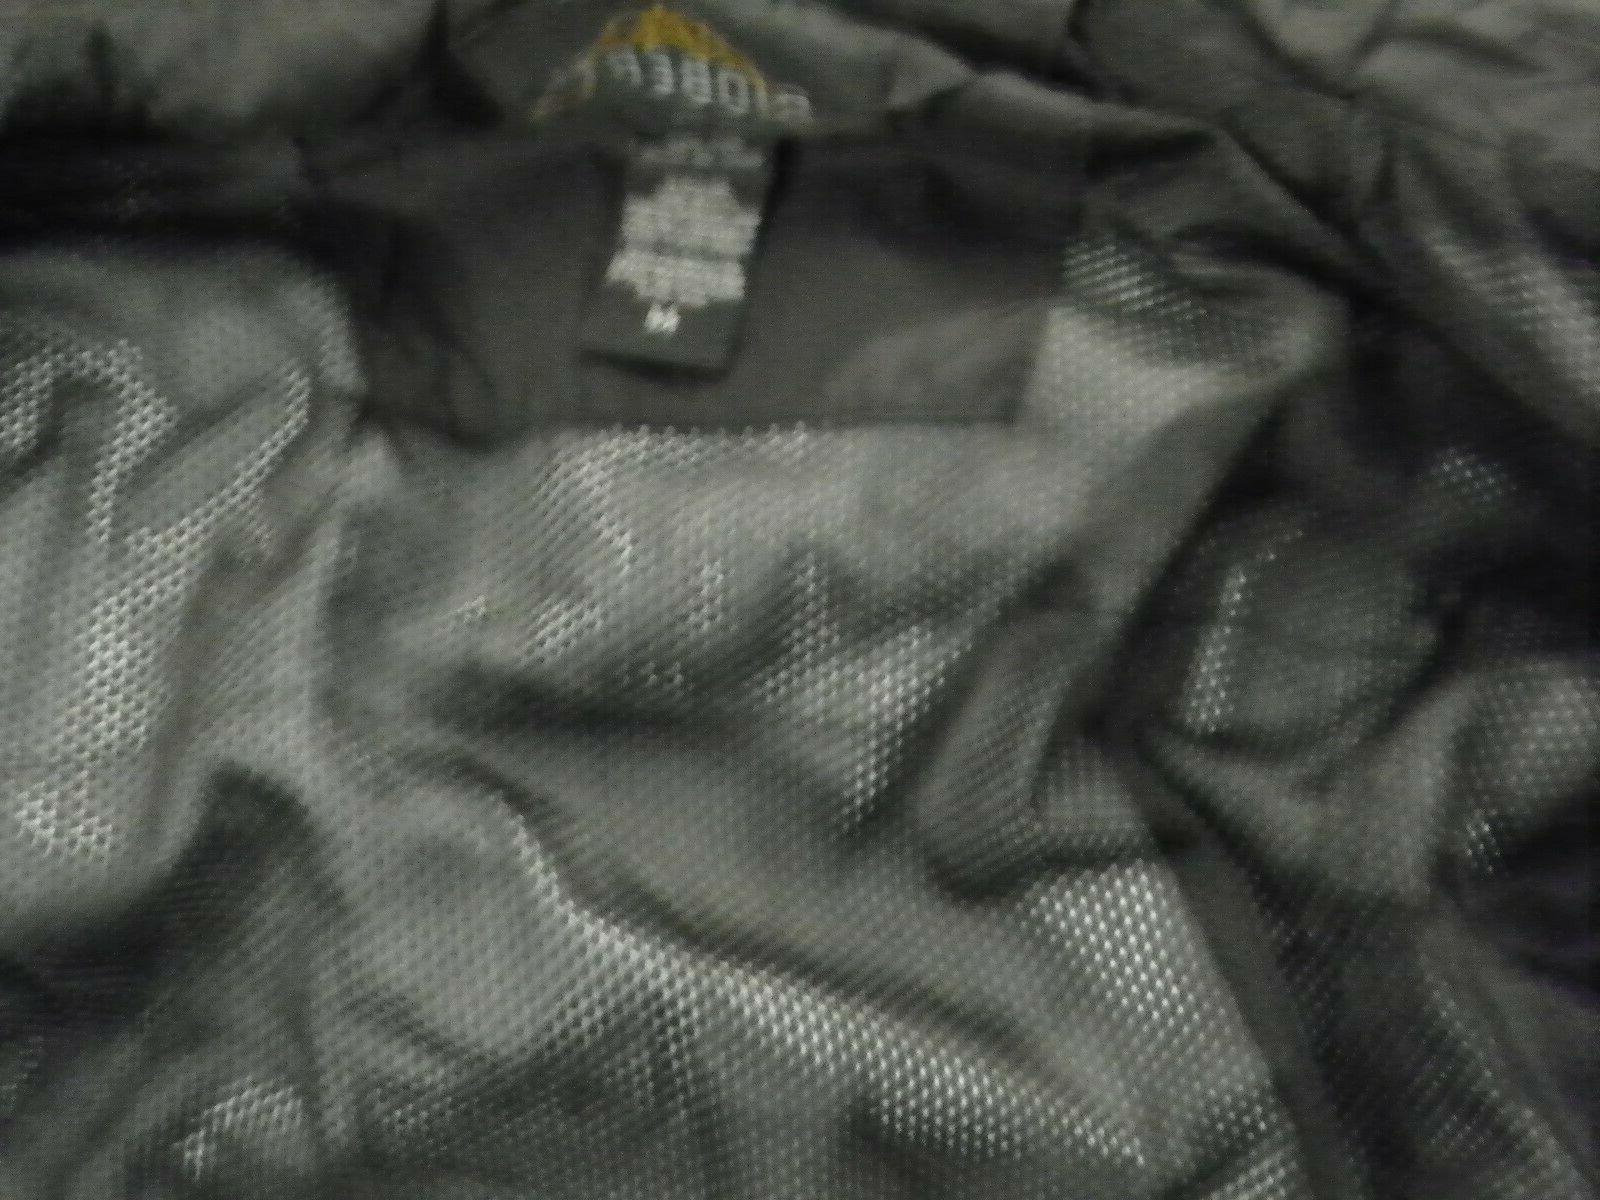 Gioberti Waterproof Rain Jacket #JA945 With ND